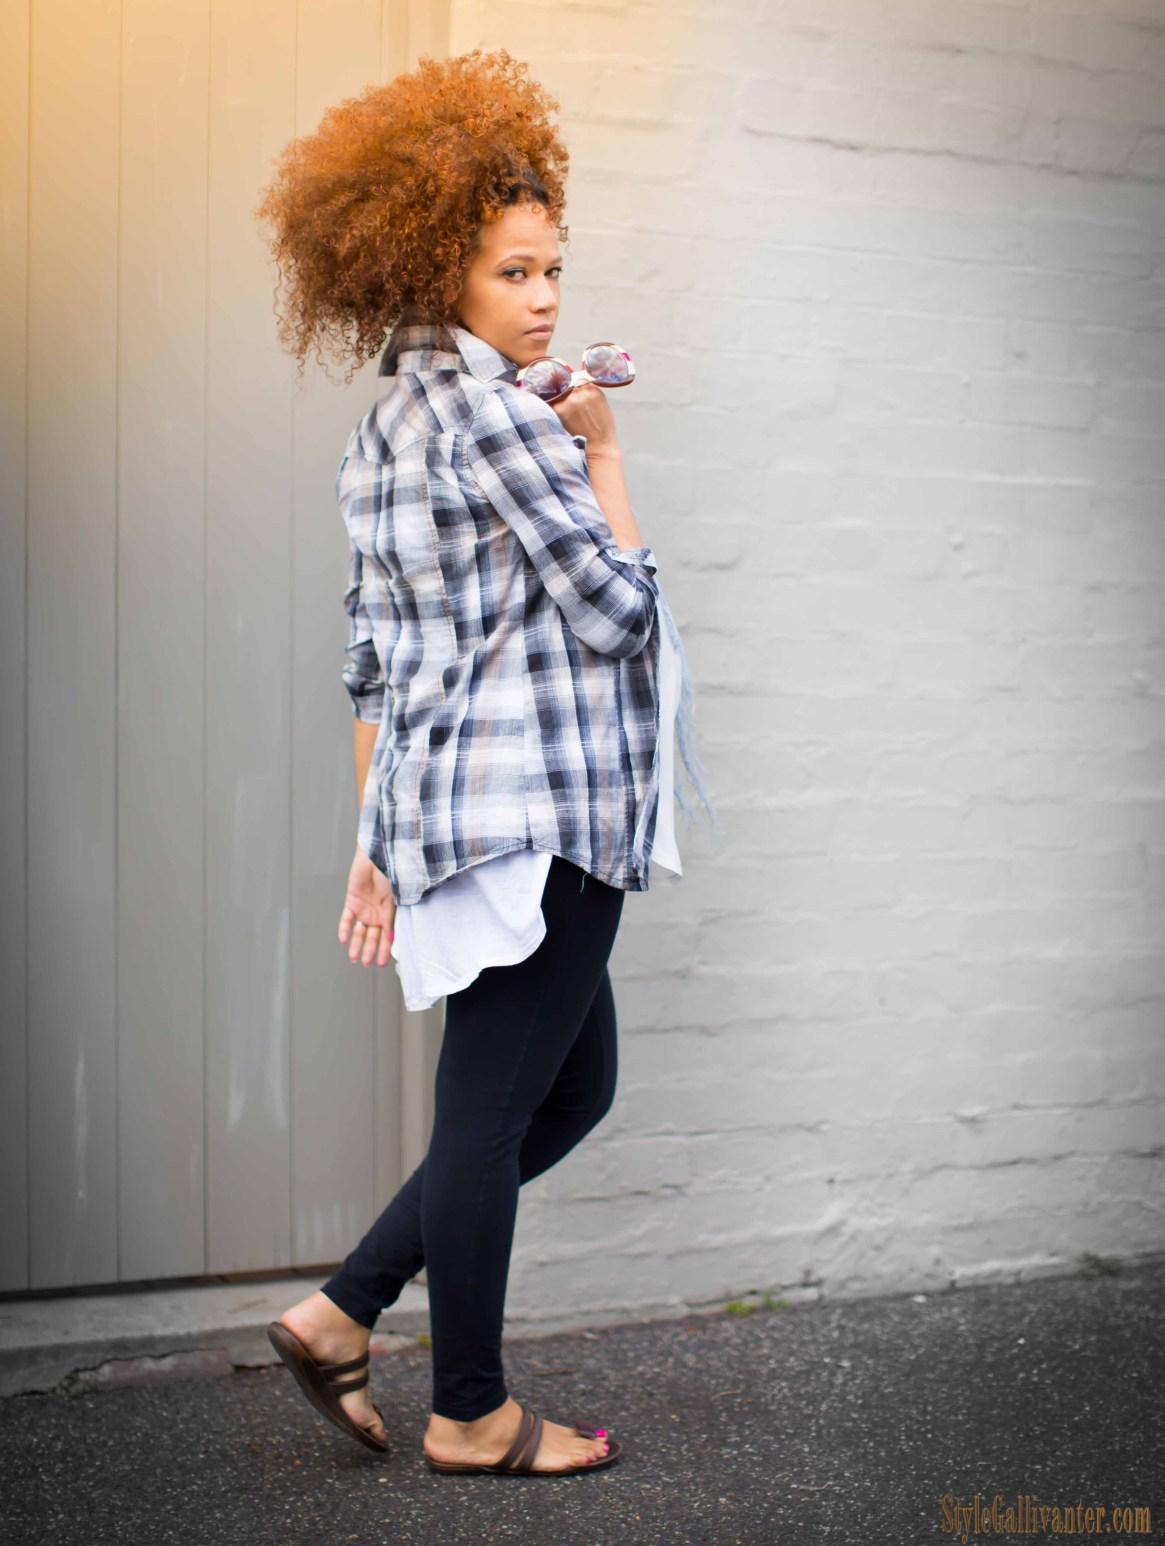 MIRANDA-SAKHINO-2015_STYLEGALLIVANTER.COM_STYLEGALLAVANTER_AFRICAN-FASHION-BLOGGERS_mommy-bloggers-australia_top-mum-blogs-melbourne_stylish-mum-bloggers-australia-2